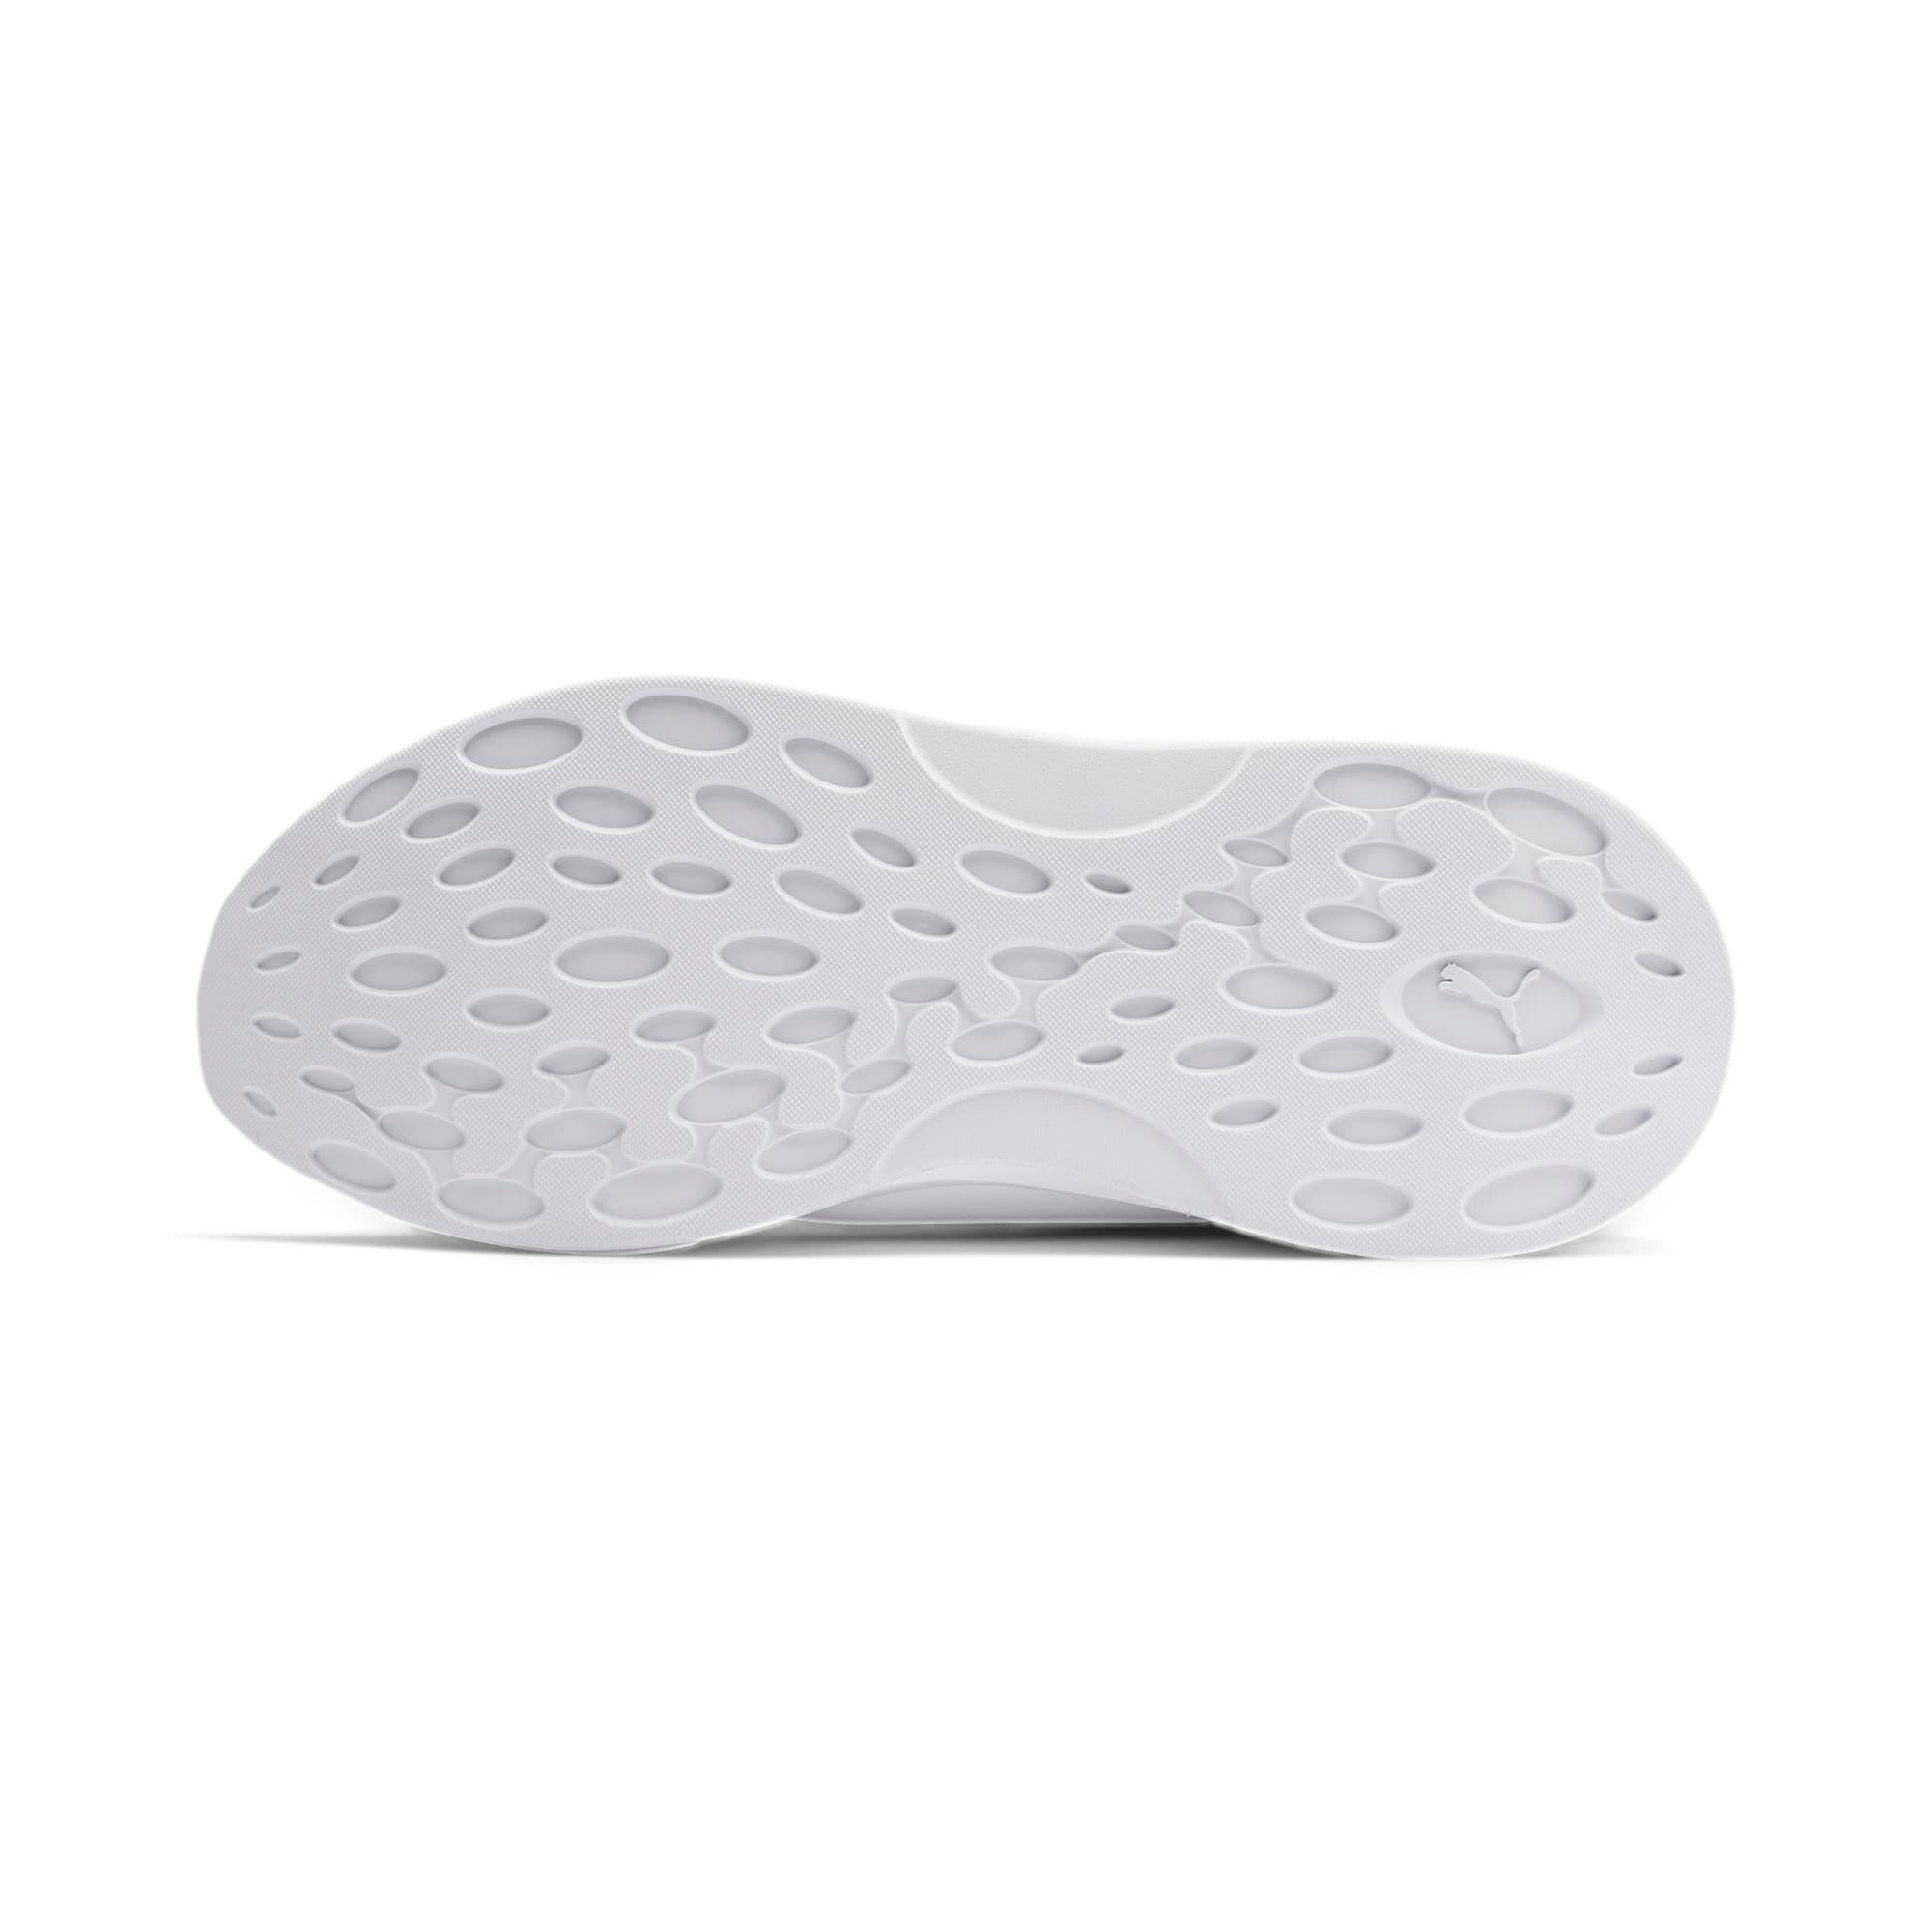 Thumbnail 4 of RS 9.8 Sneaker, Puma White, medium